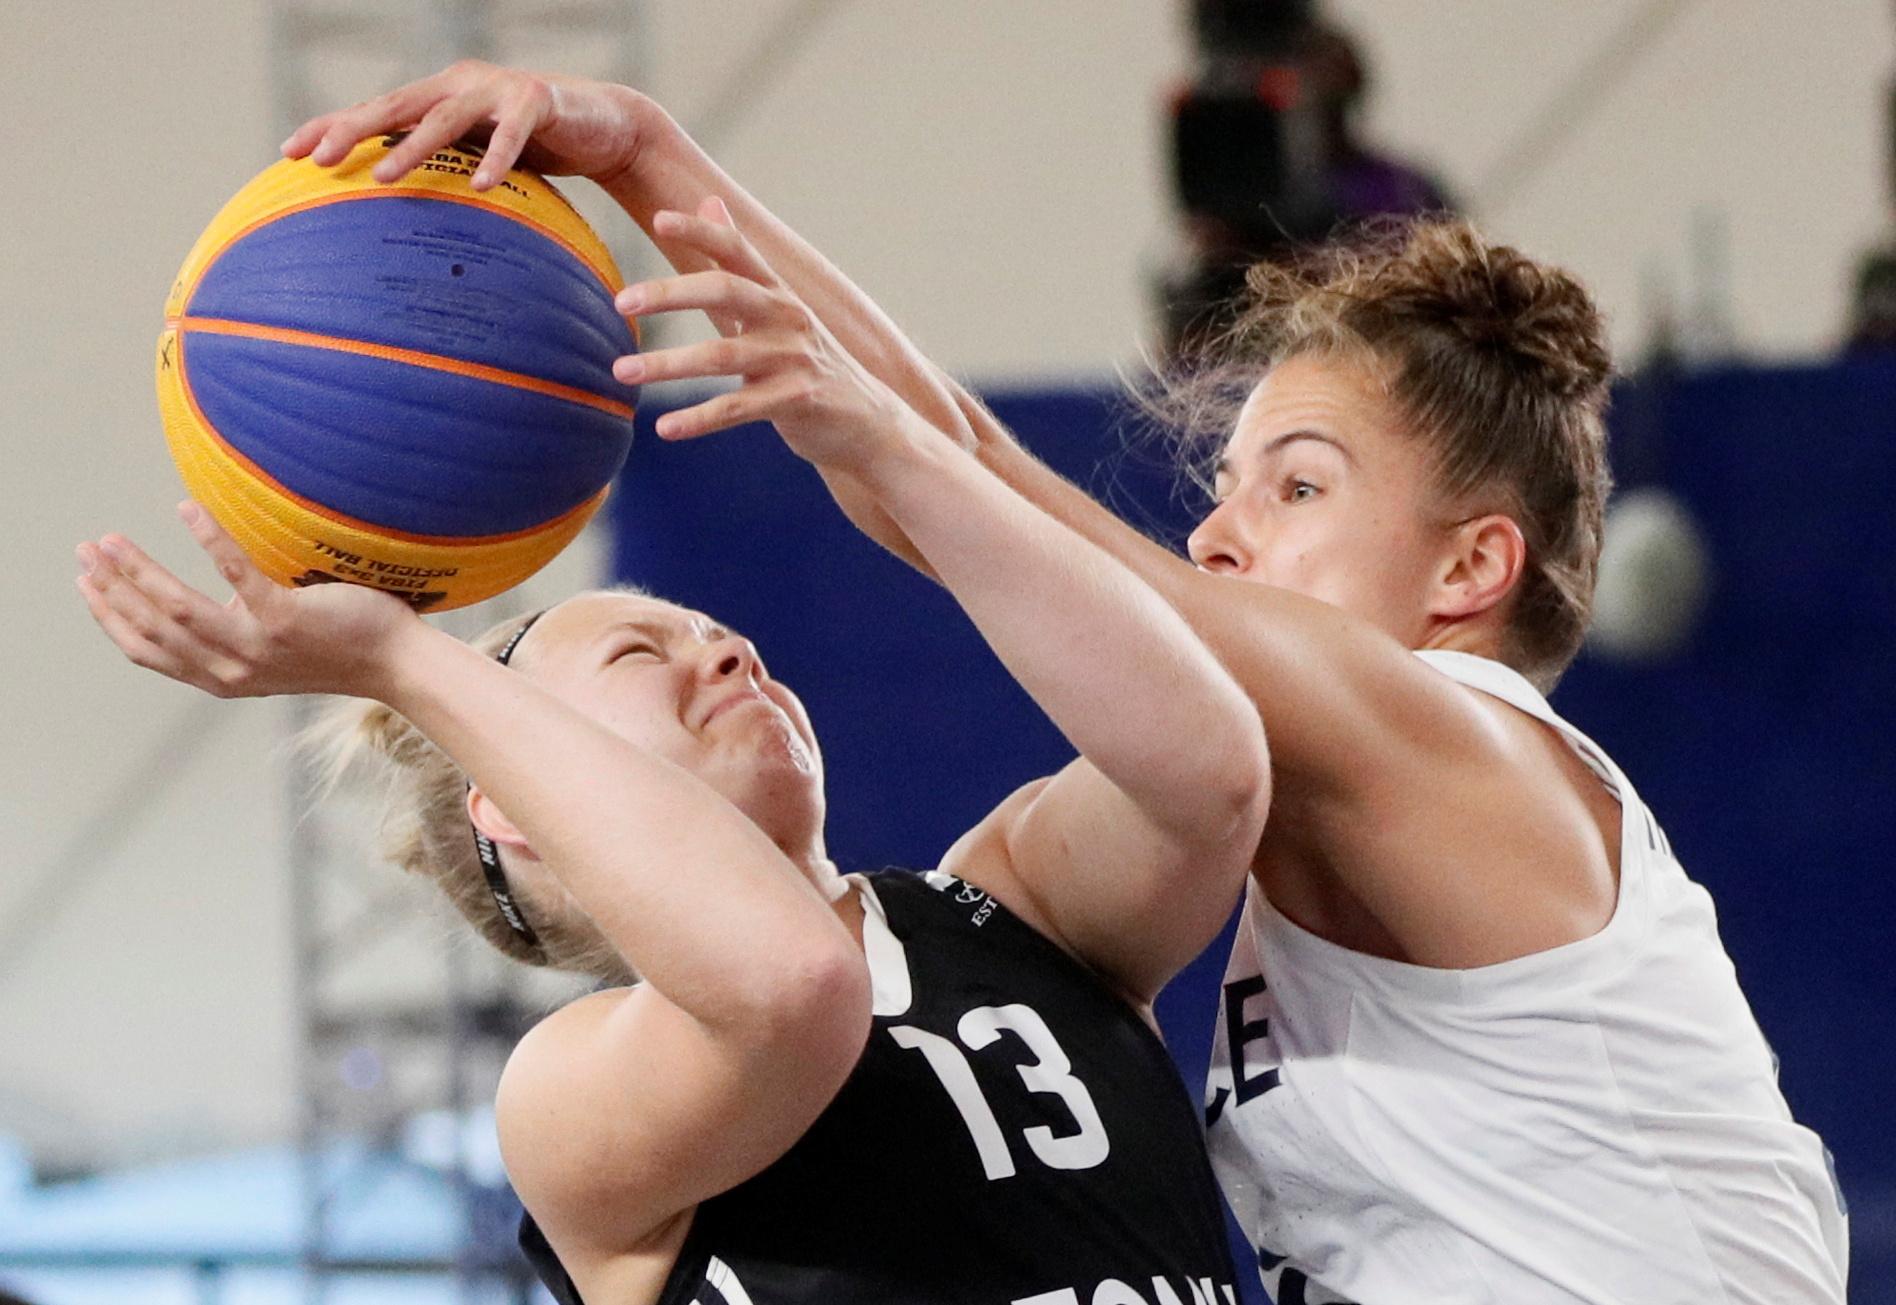 2019 European Games - 3X3 Basketball - Women's - Estonia vs France - Palova Arena, Minsk, Belarus - June 24, 2019.  Estonia's Janne Pulk in action with France's Caroline Heriaud during the gold medal match REUTERS/Valentyn Ogirenko/File Photo